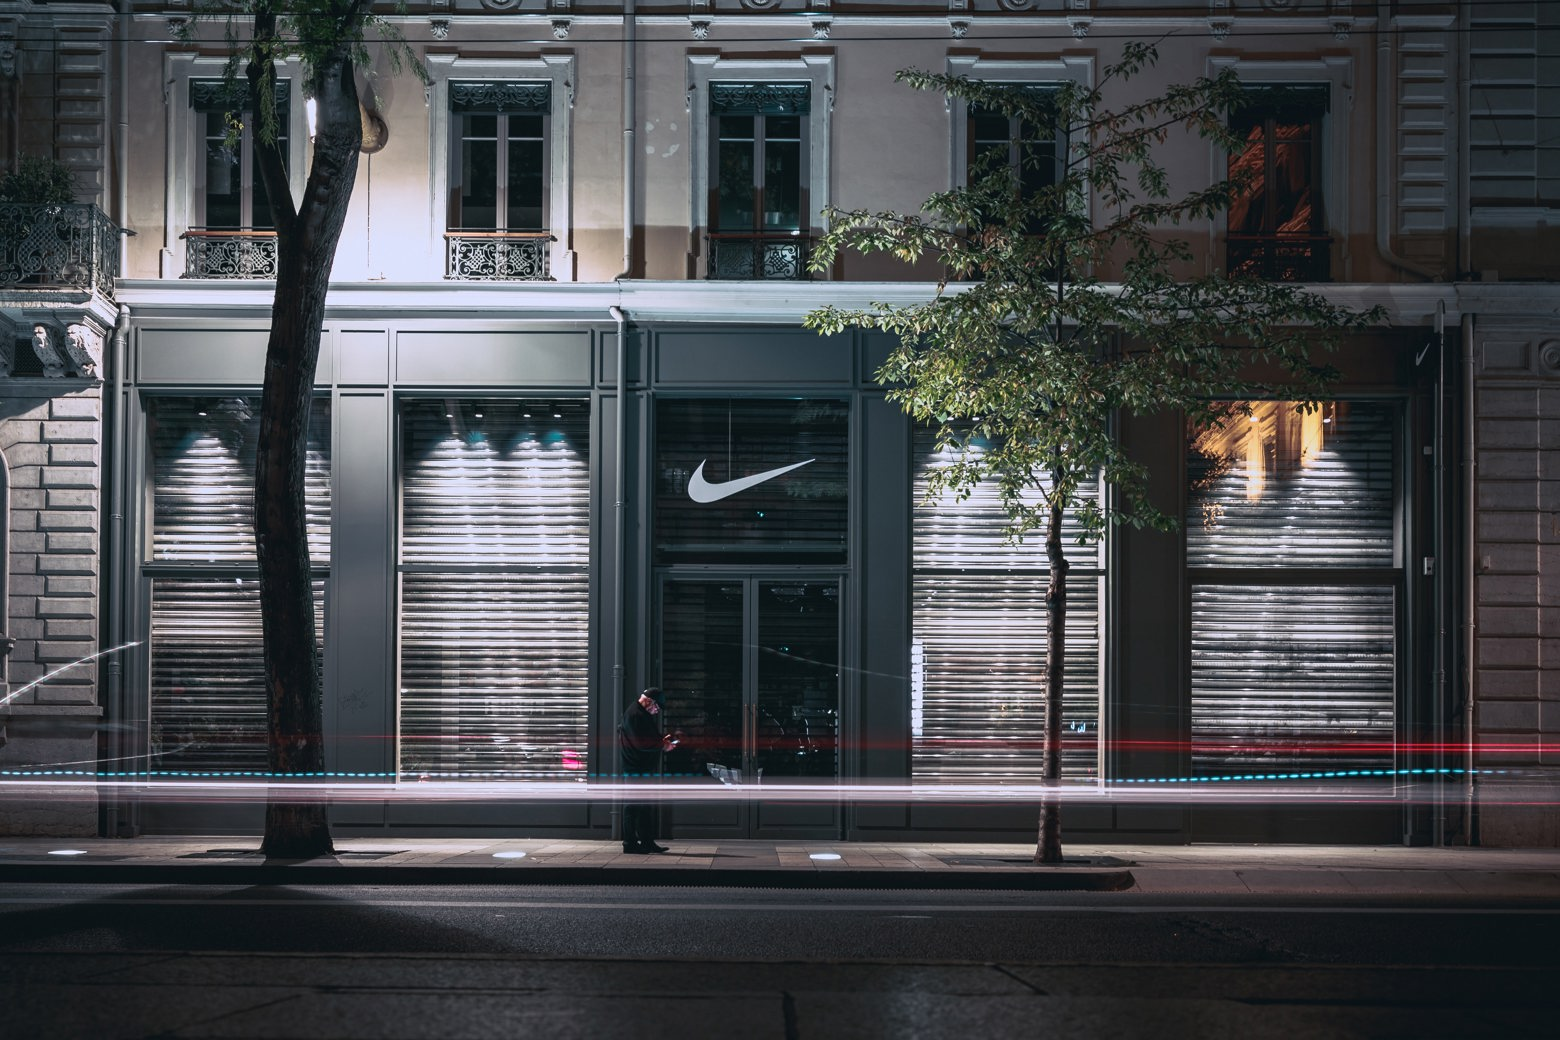 Nike NK stock market news and analysis